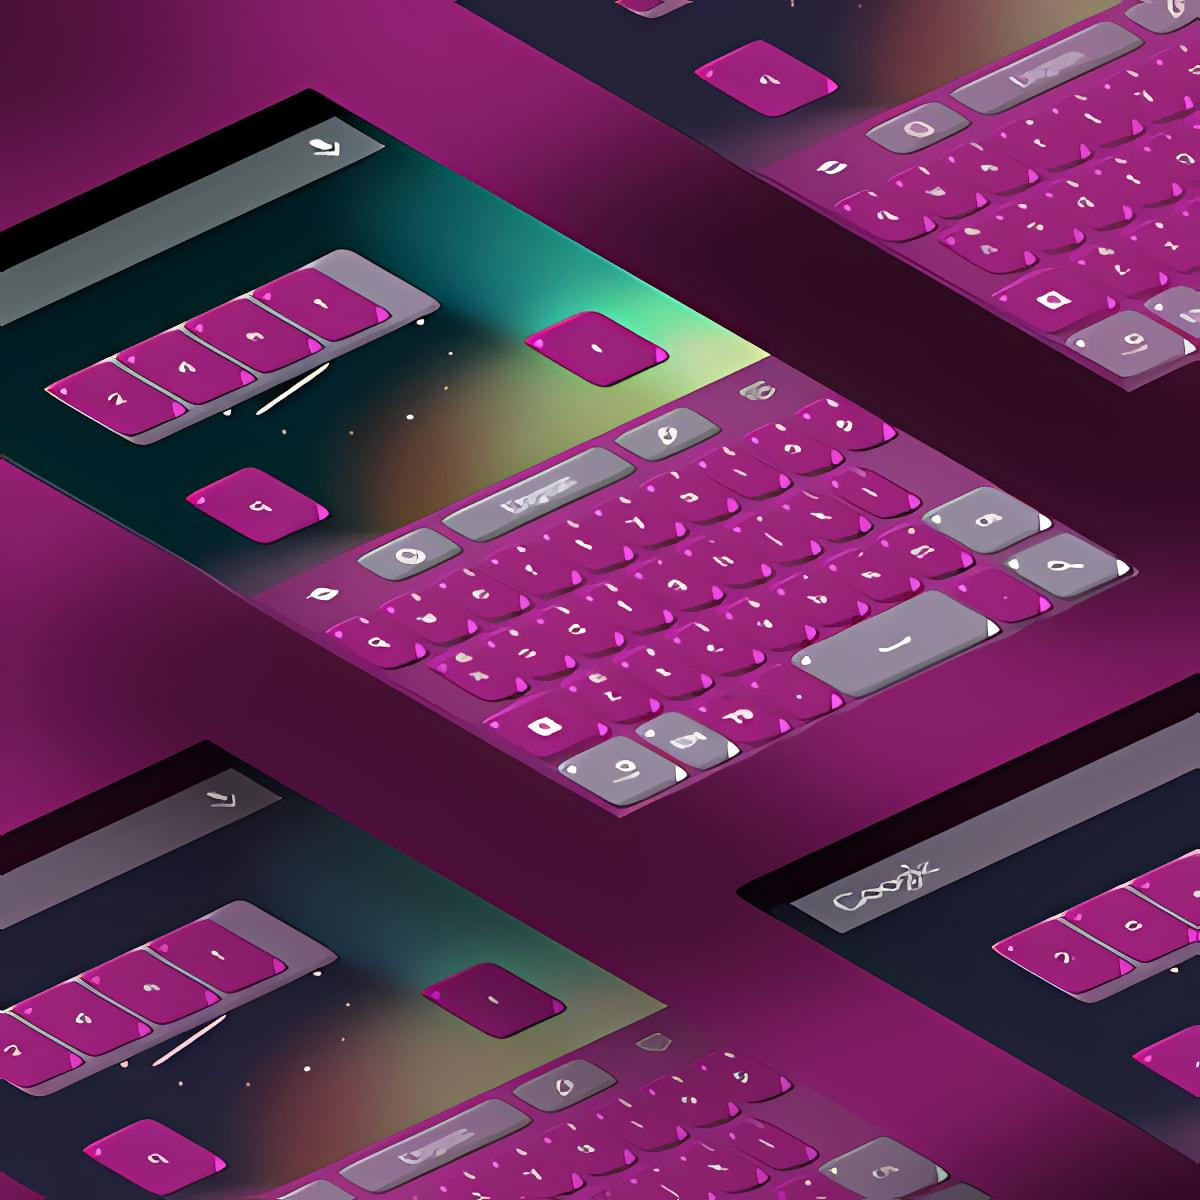 Pink Ladies Keyboard